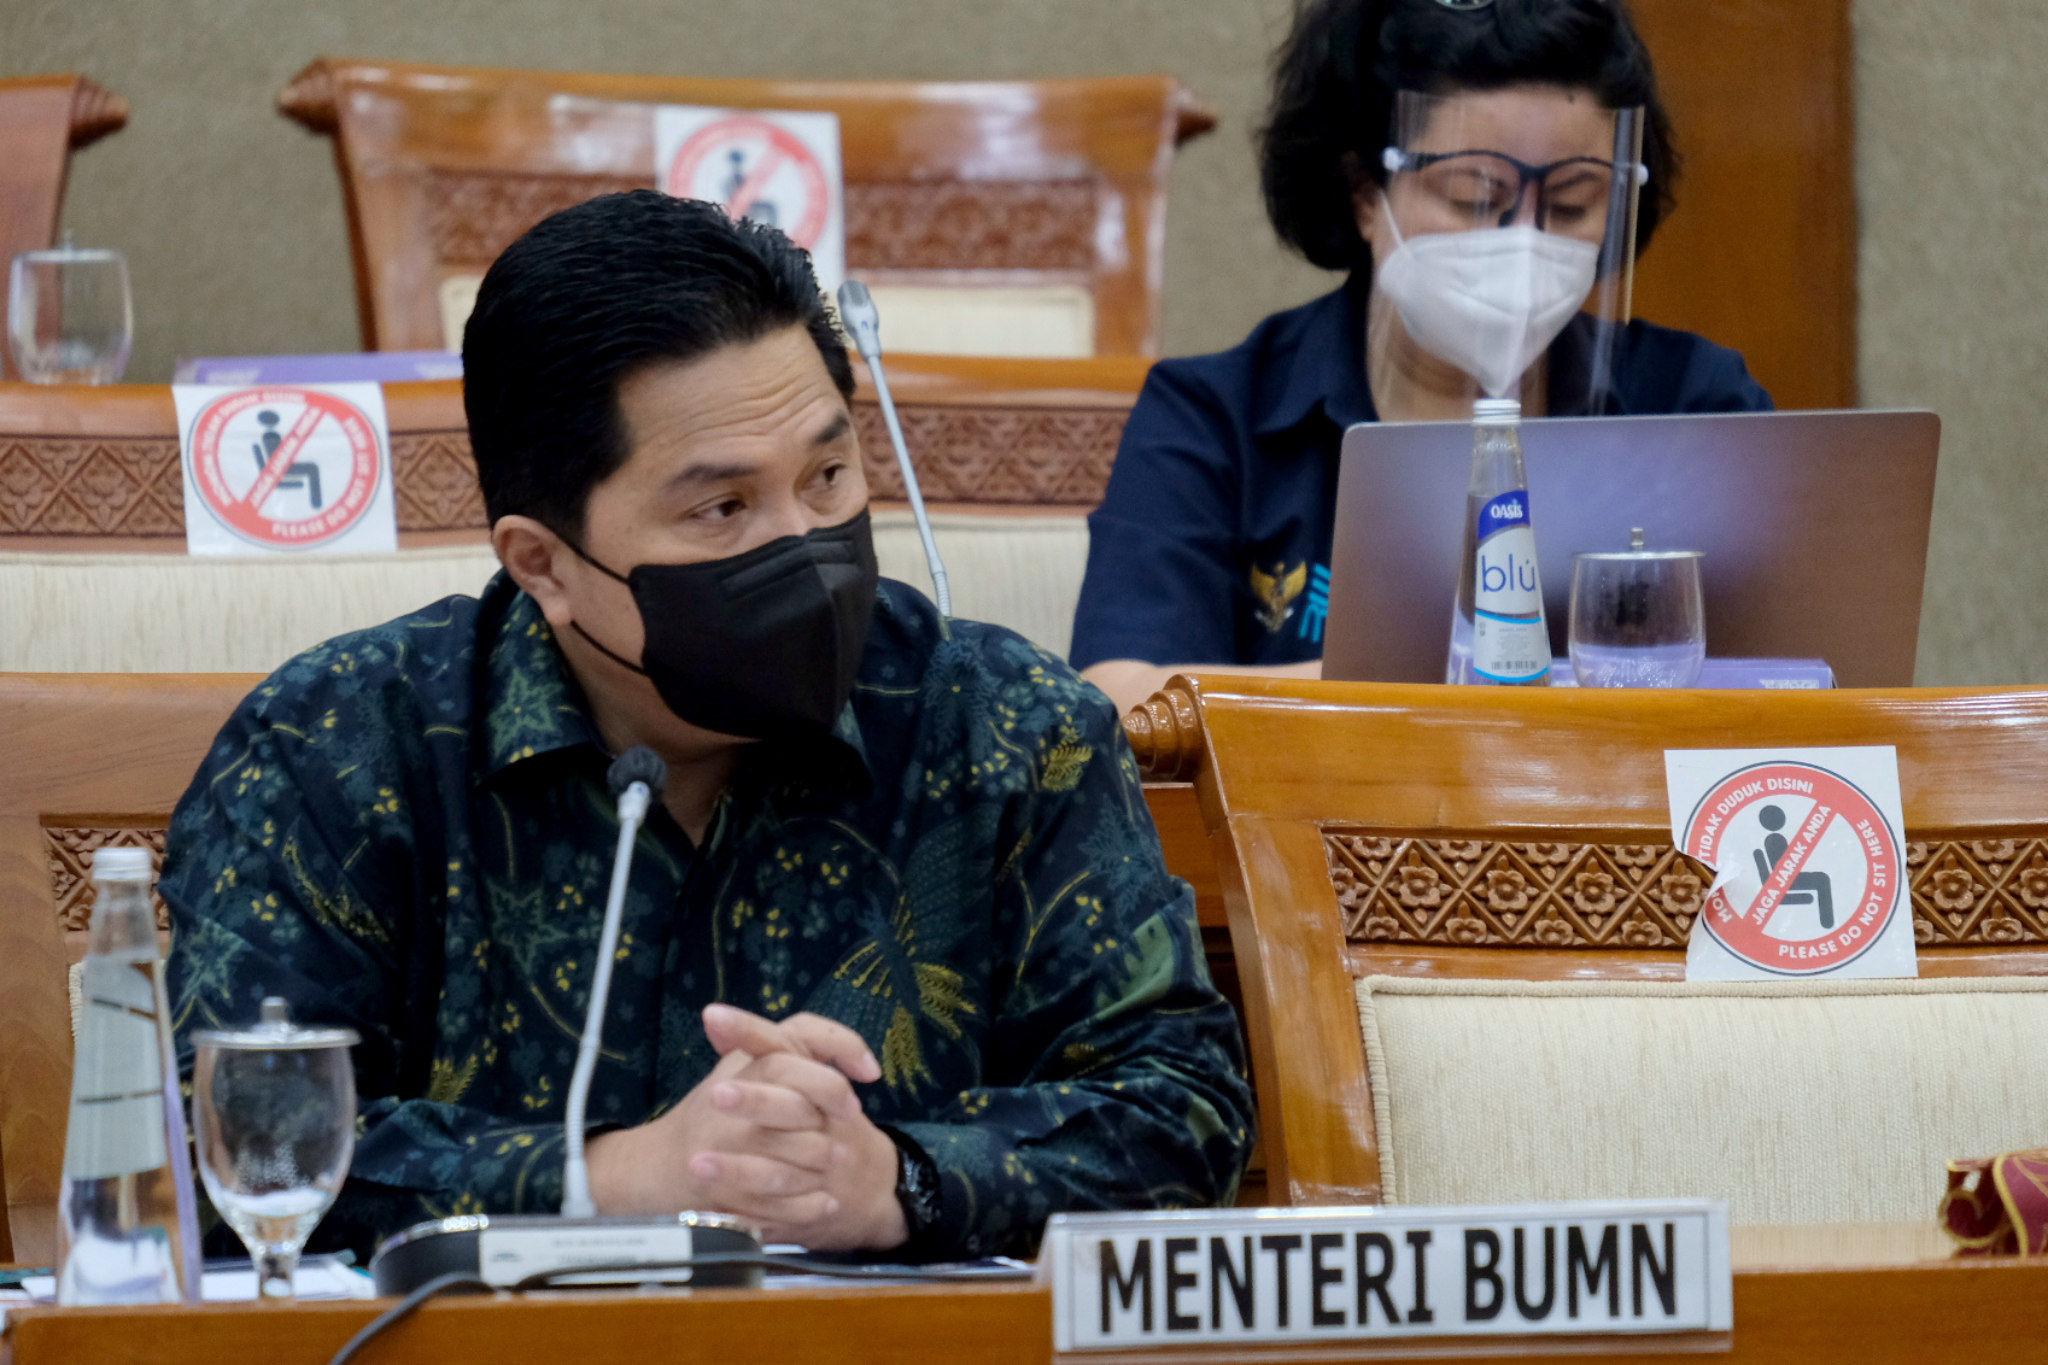 Disuntik PMN Rp20 Triliun, Erick Thohir Jamin Restrukturisasi Polis Jiwasraya ke IFG LIfe Berjalan Lancar